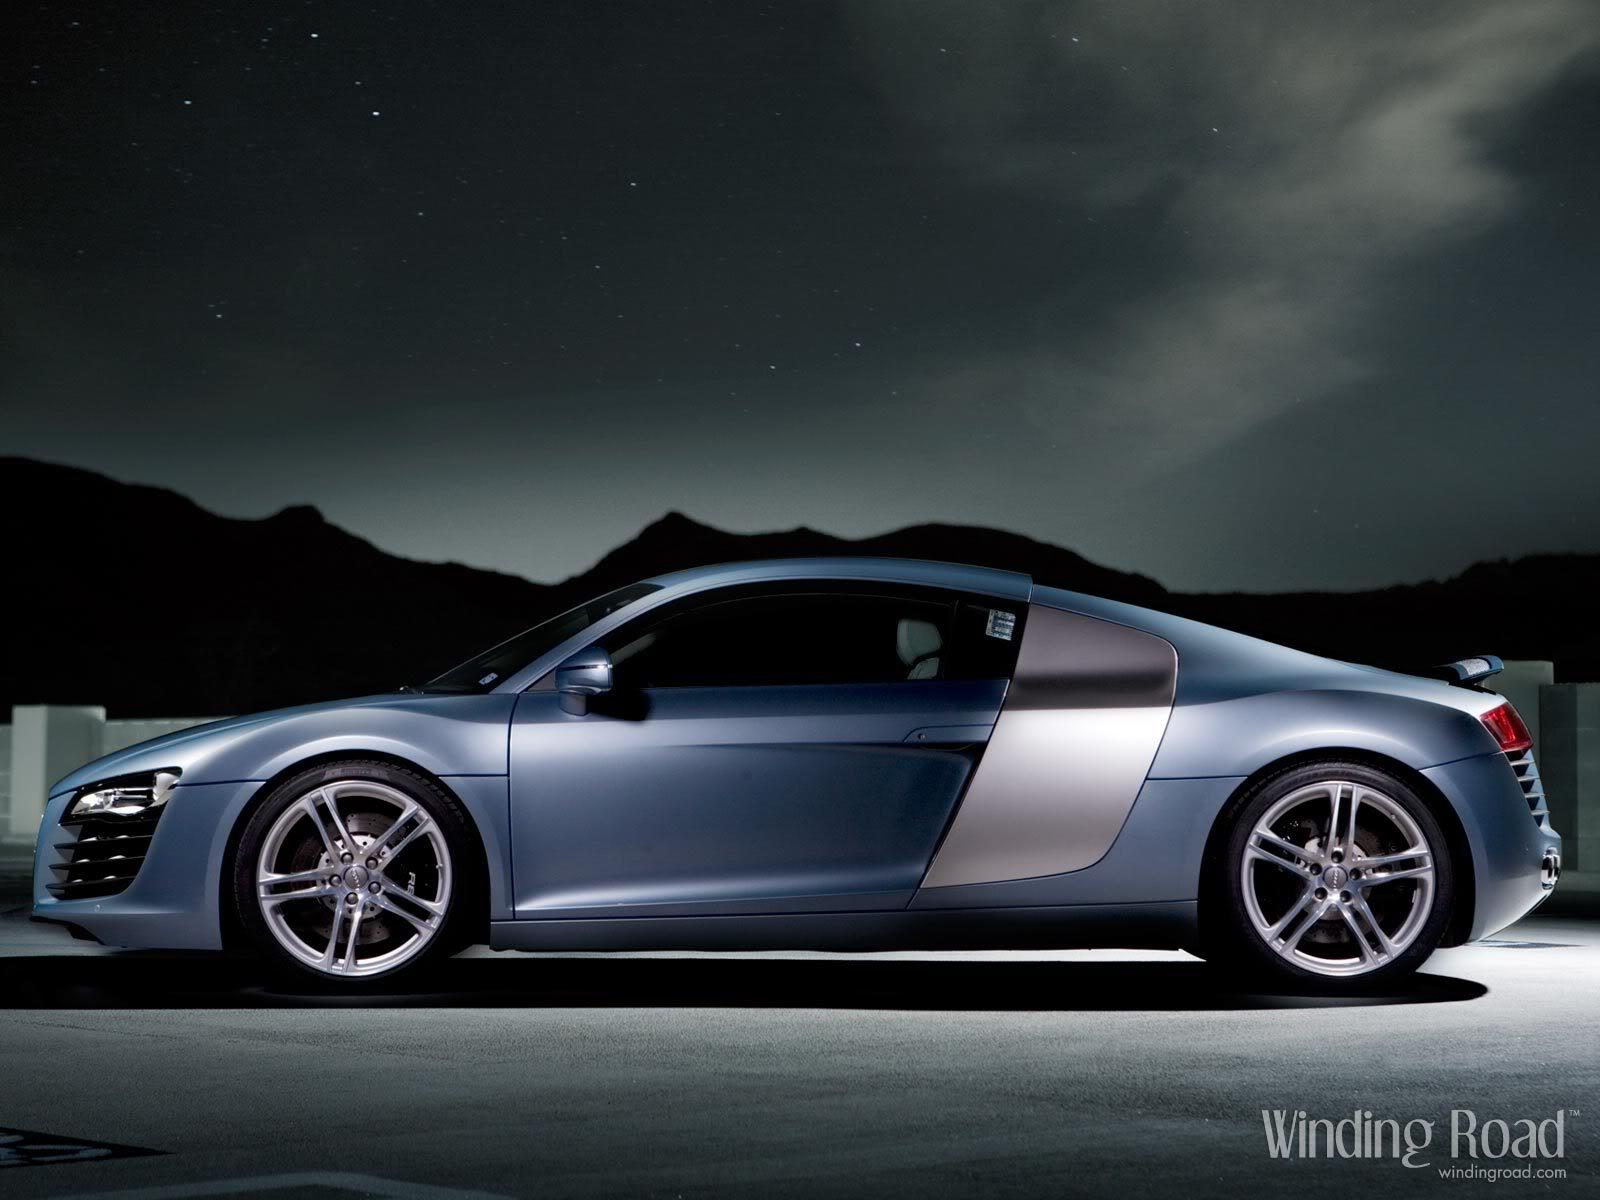 Audi R8 Wallpaper Audi R8 Desktop Background 1600x1200